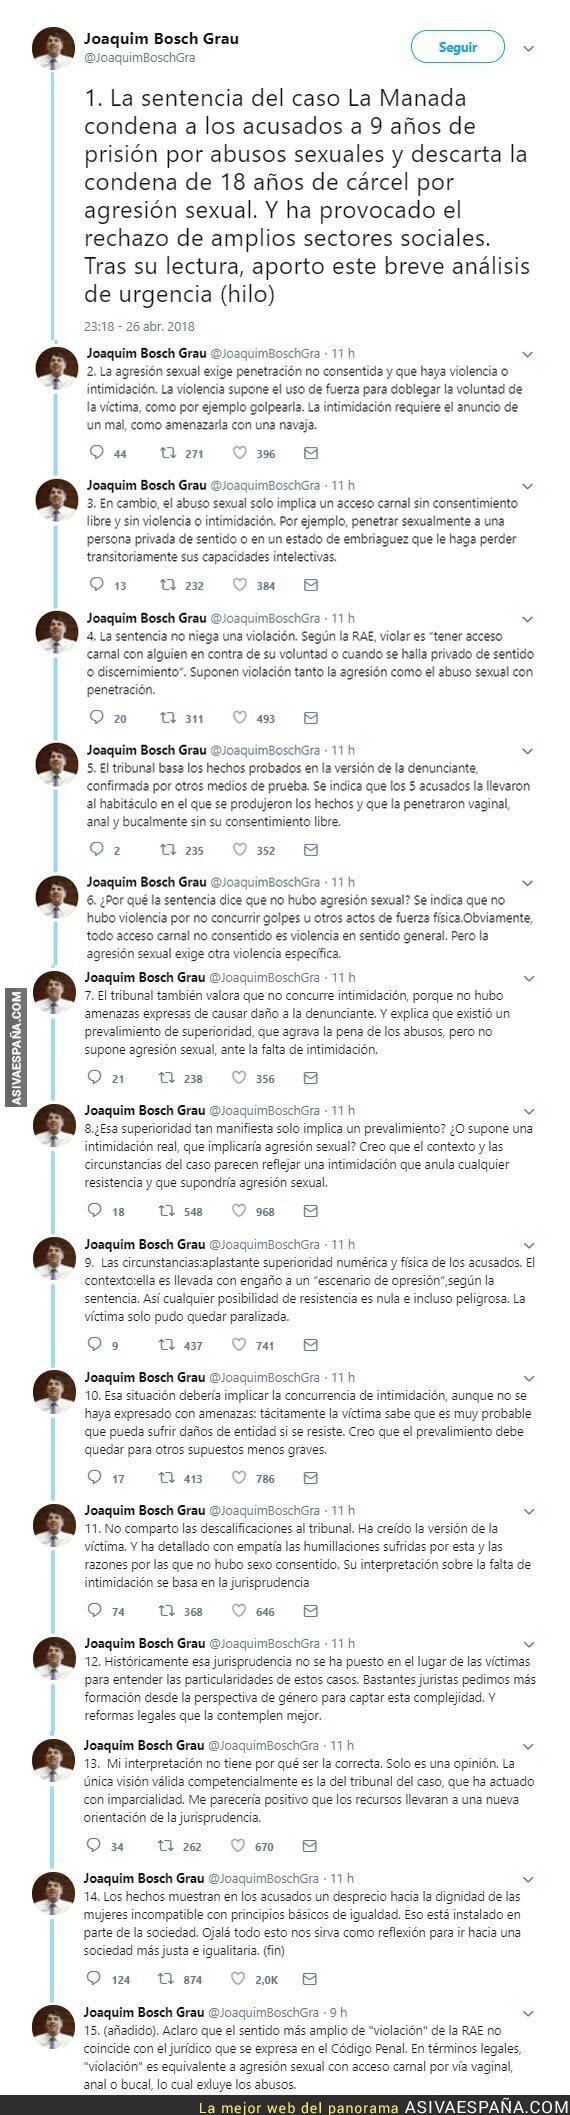 86076 - Joaquim Bosch sobre la sentencia de la La Manada